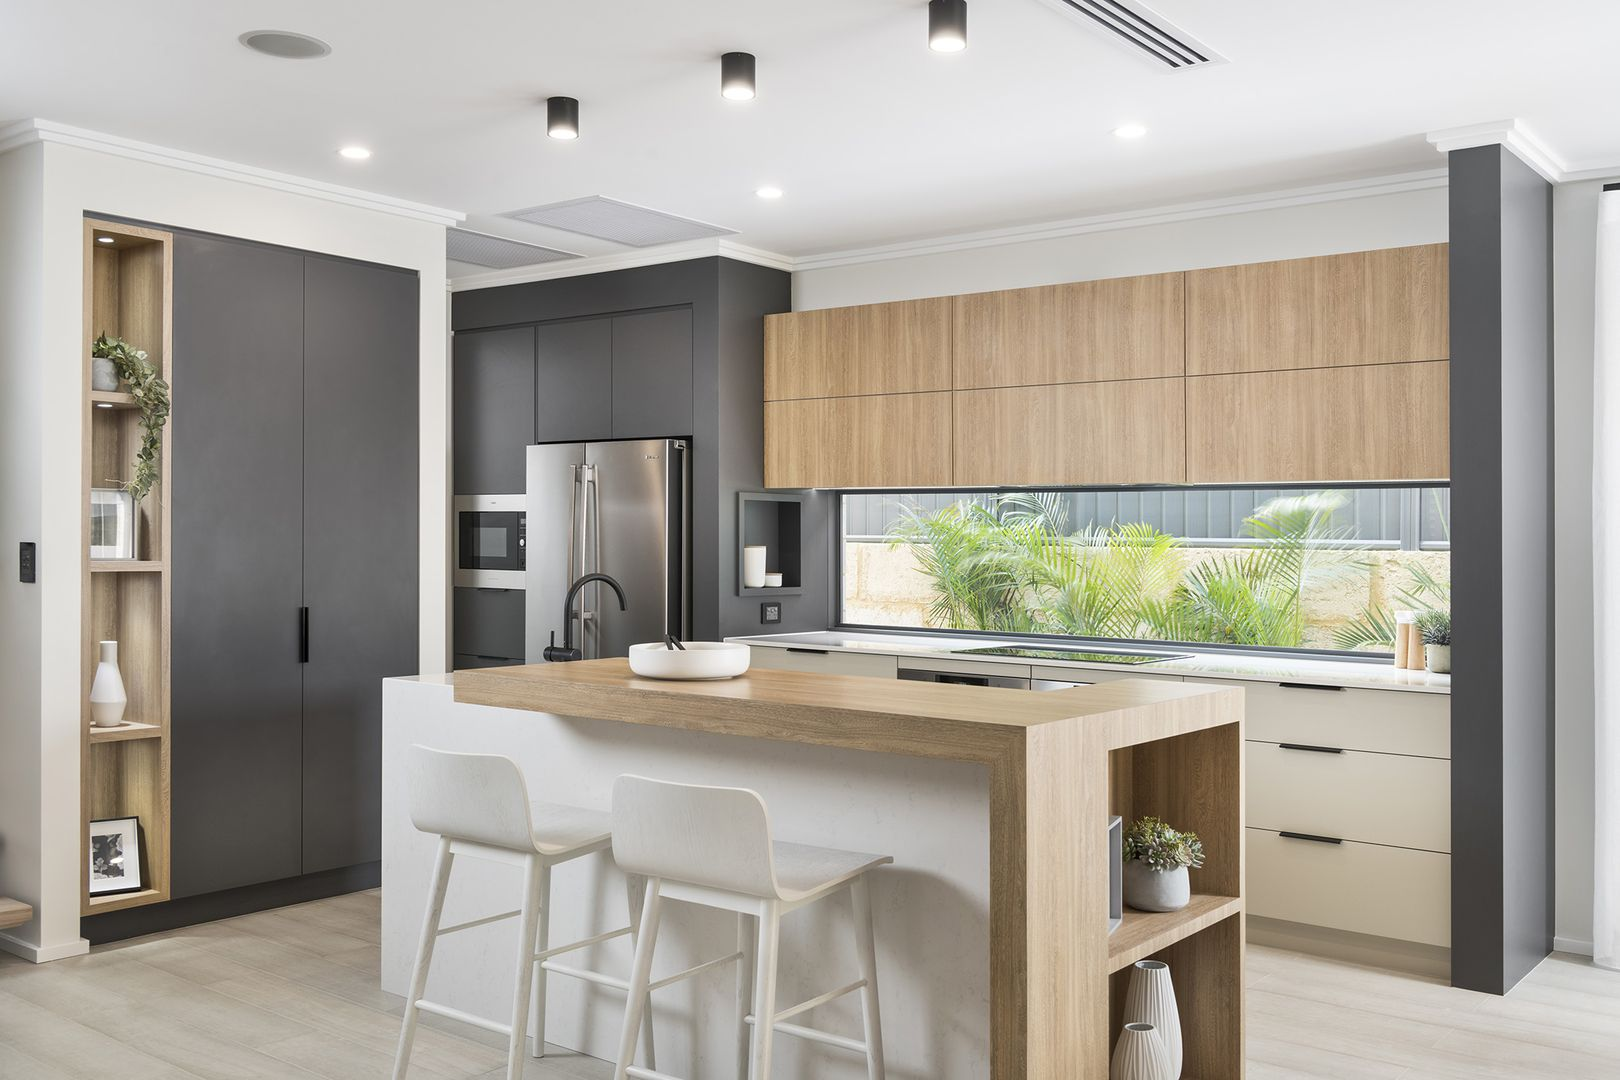 4 bedrooms New House & Land in Lot 758 Corbel Way BRABHAM WA, 6055